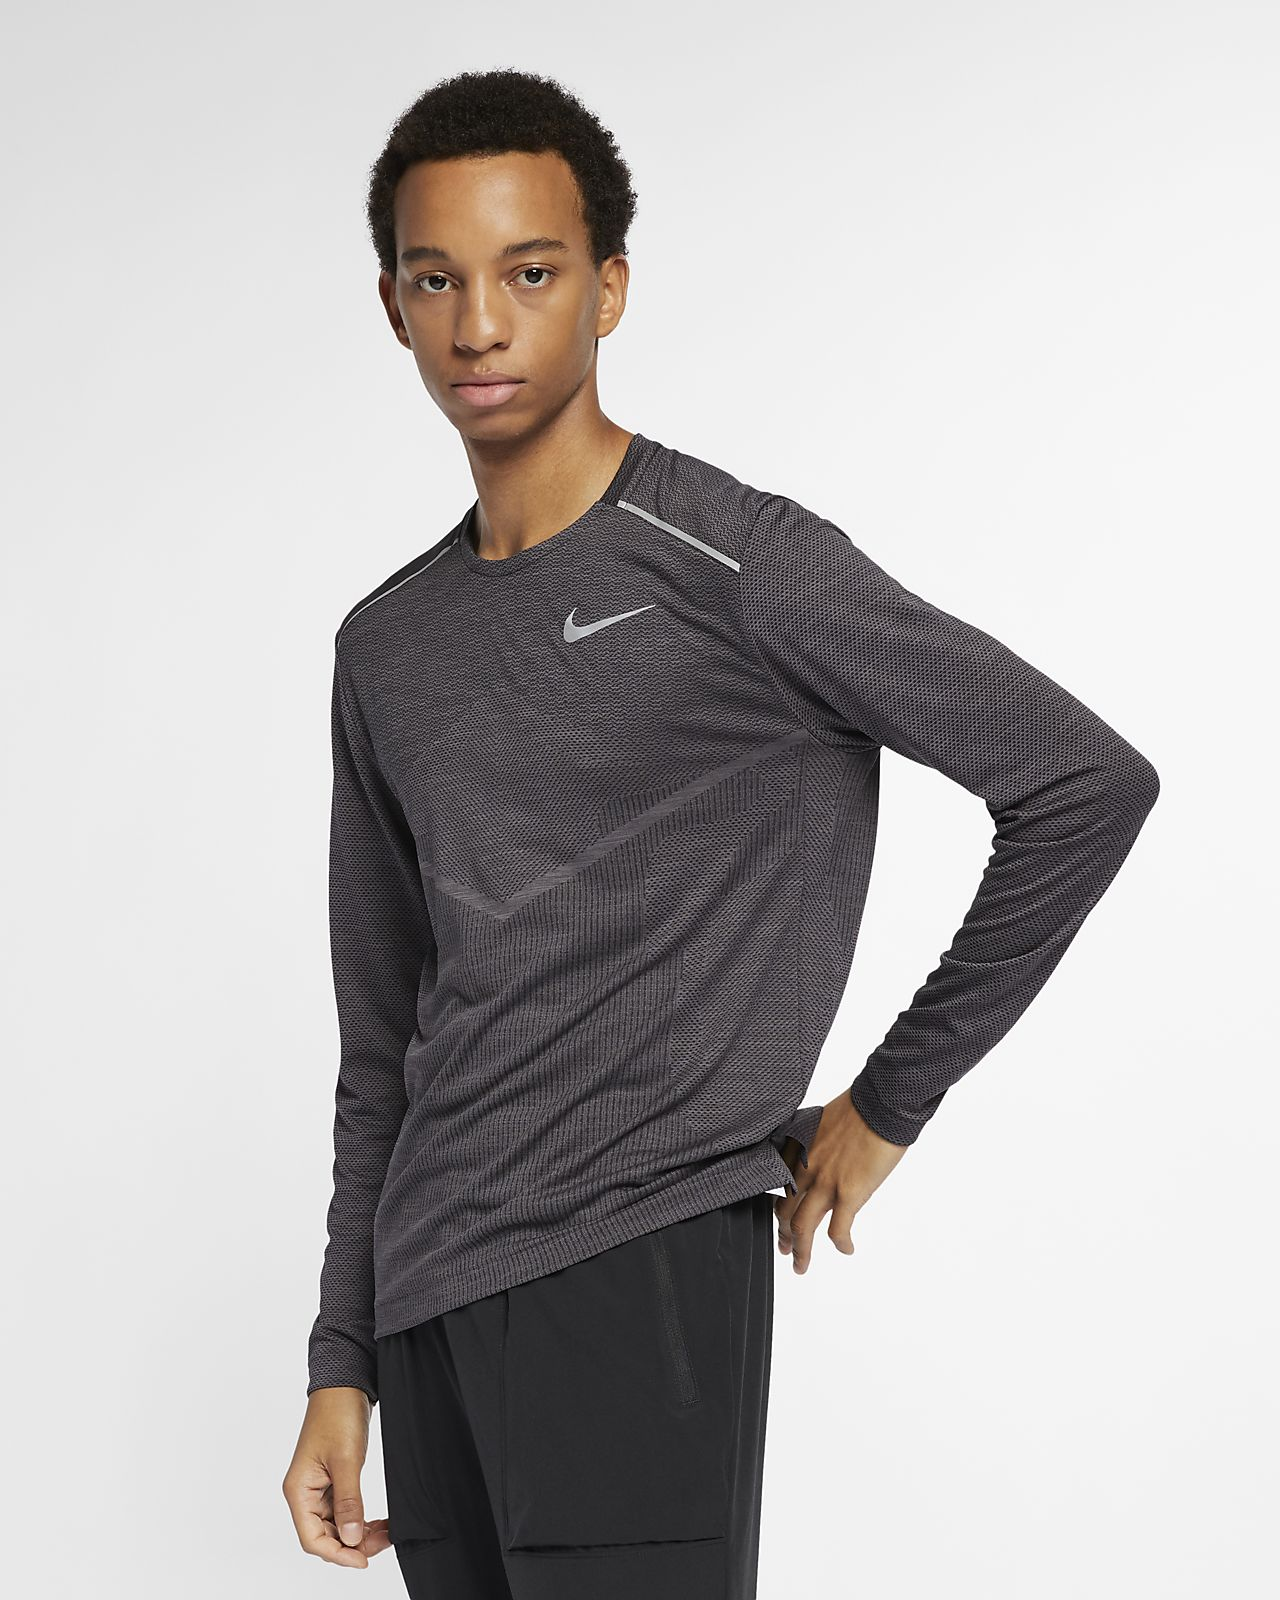 Мужская беговая футболка с длинным рукавом Nike TechKnit Ultra